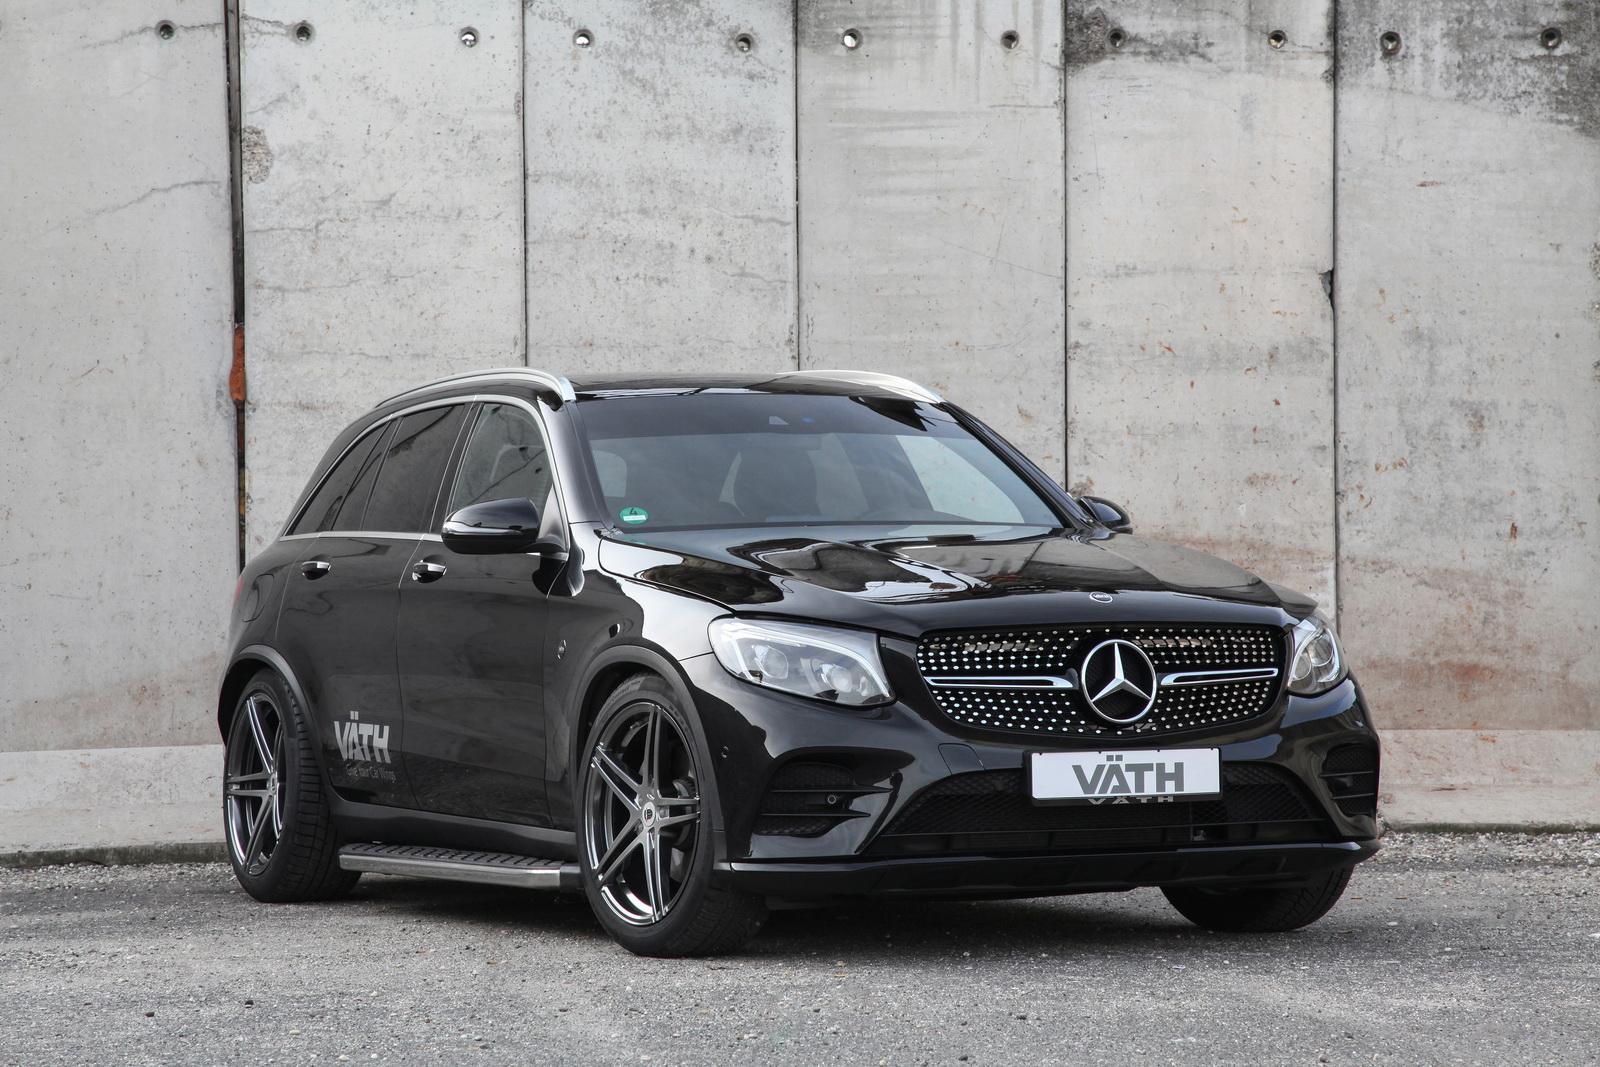 Mercedes_GLC220d_by_Vath_17